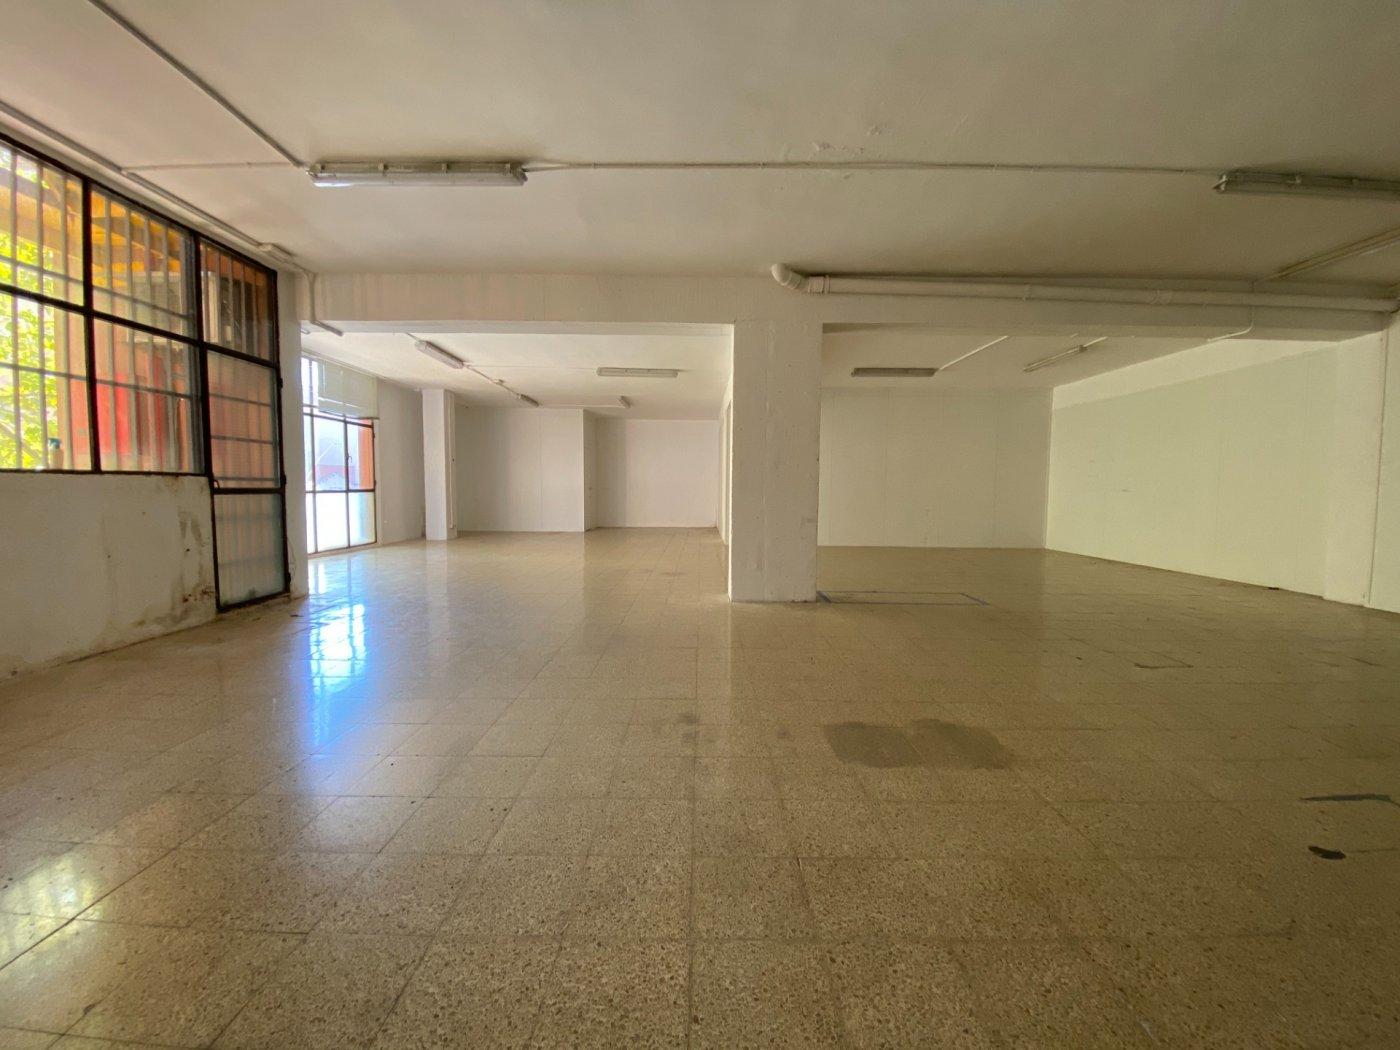 local-comercial en barcelona · el-parc-i-la-llacuna-del-poblenou 2000€